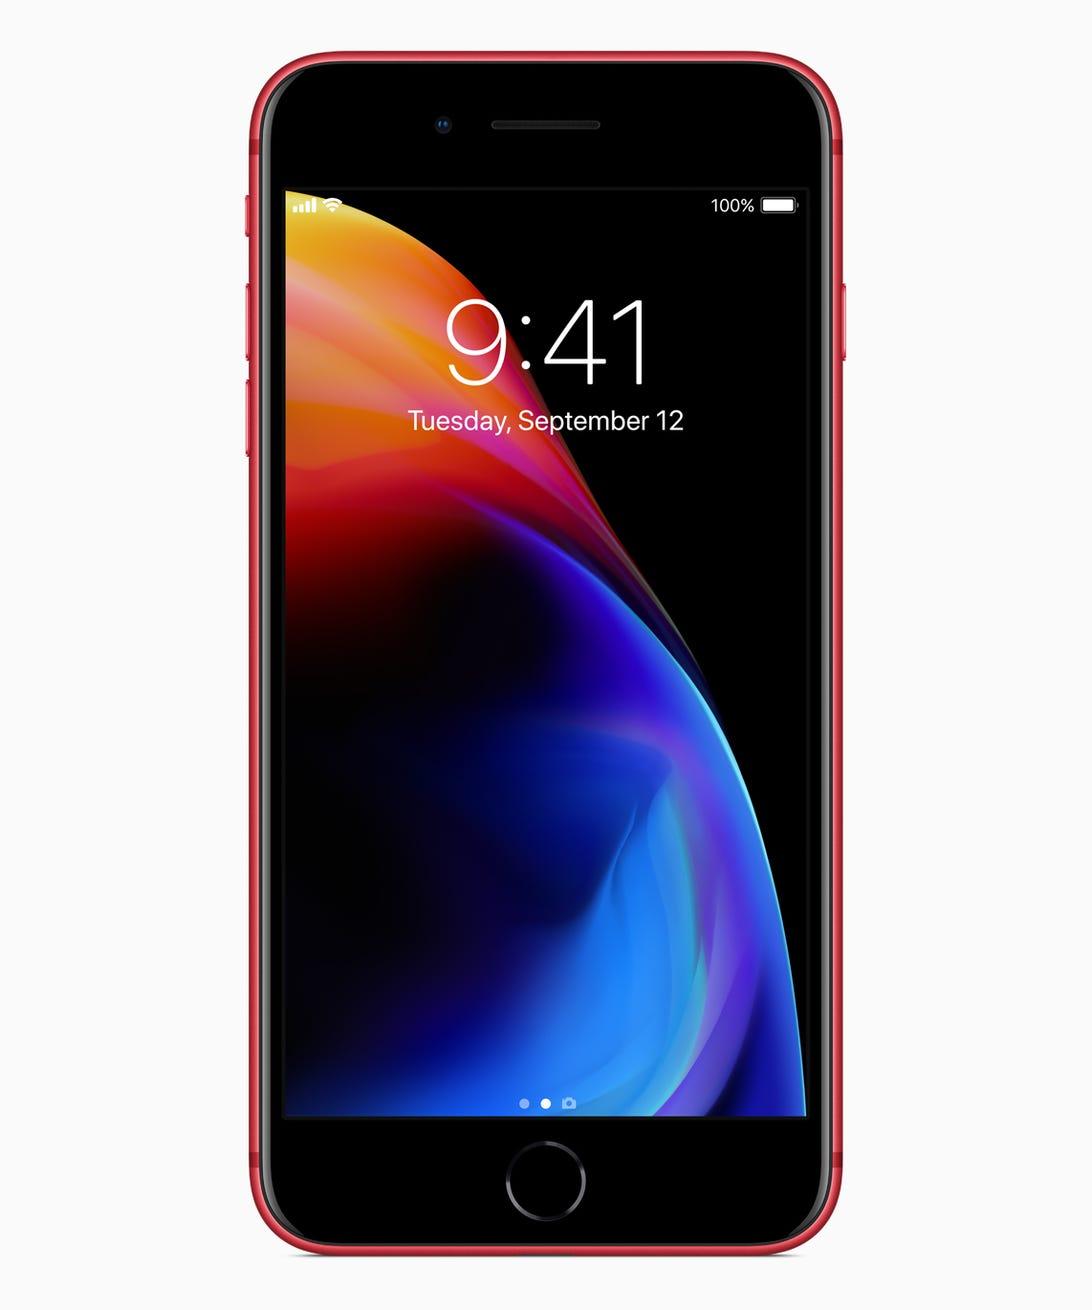 iphone8plus-product-redfront041018.jpg